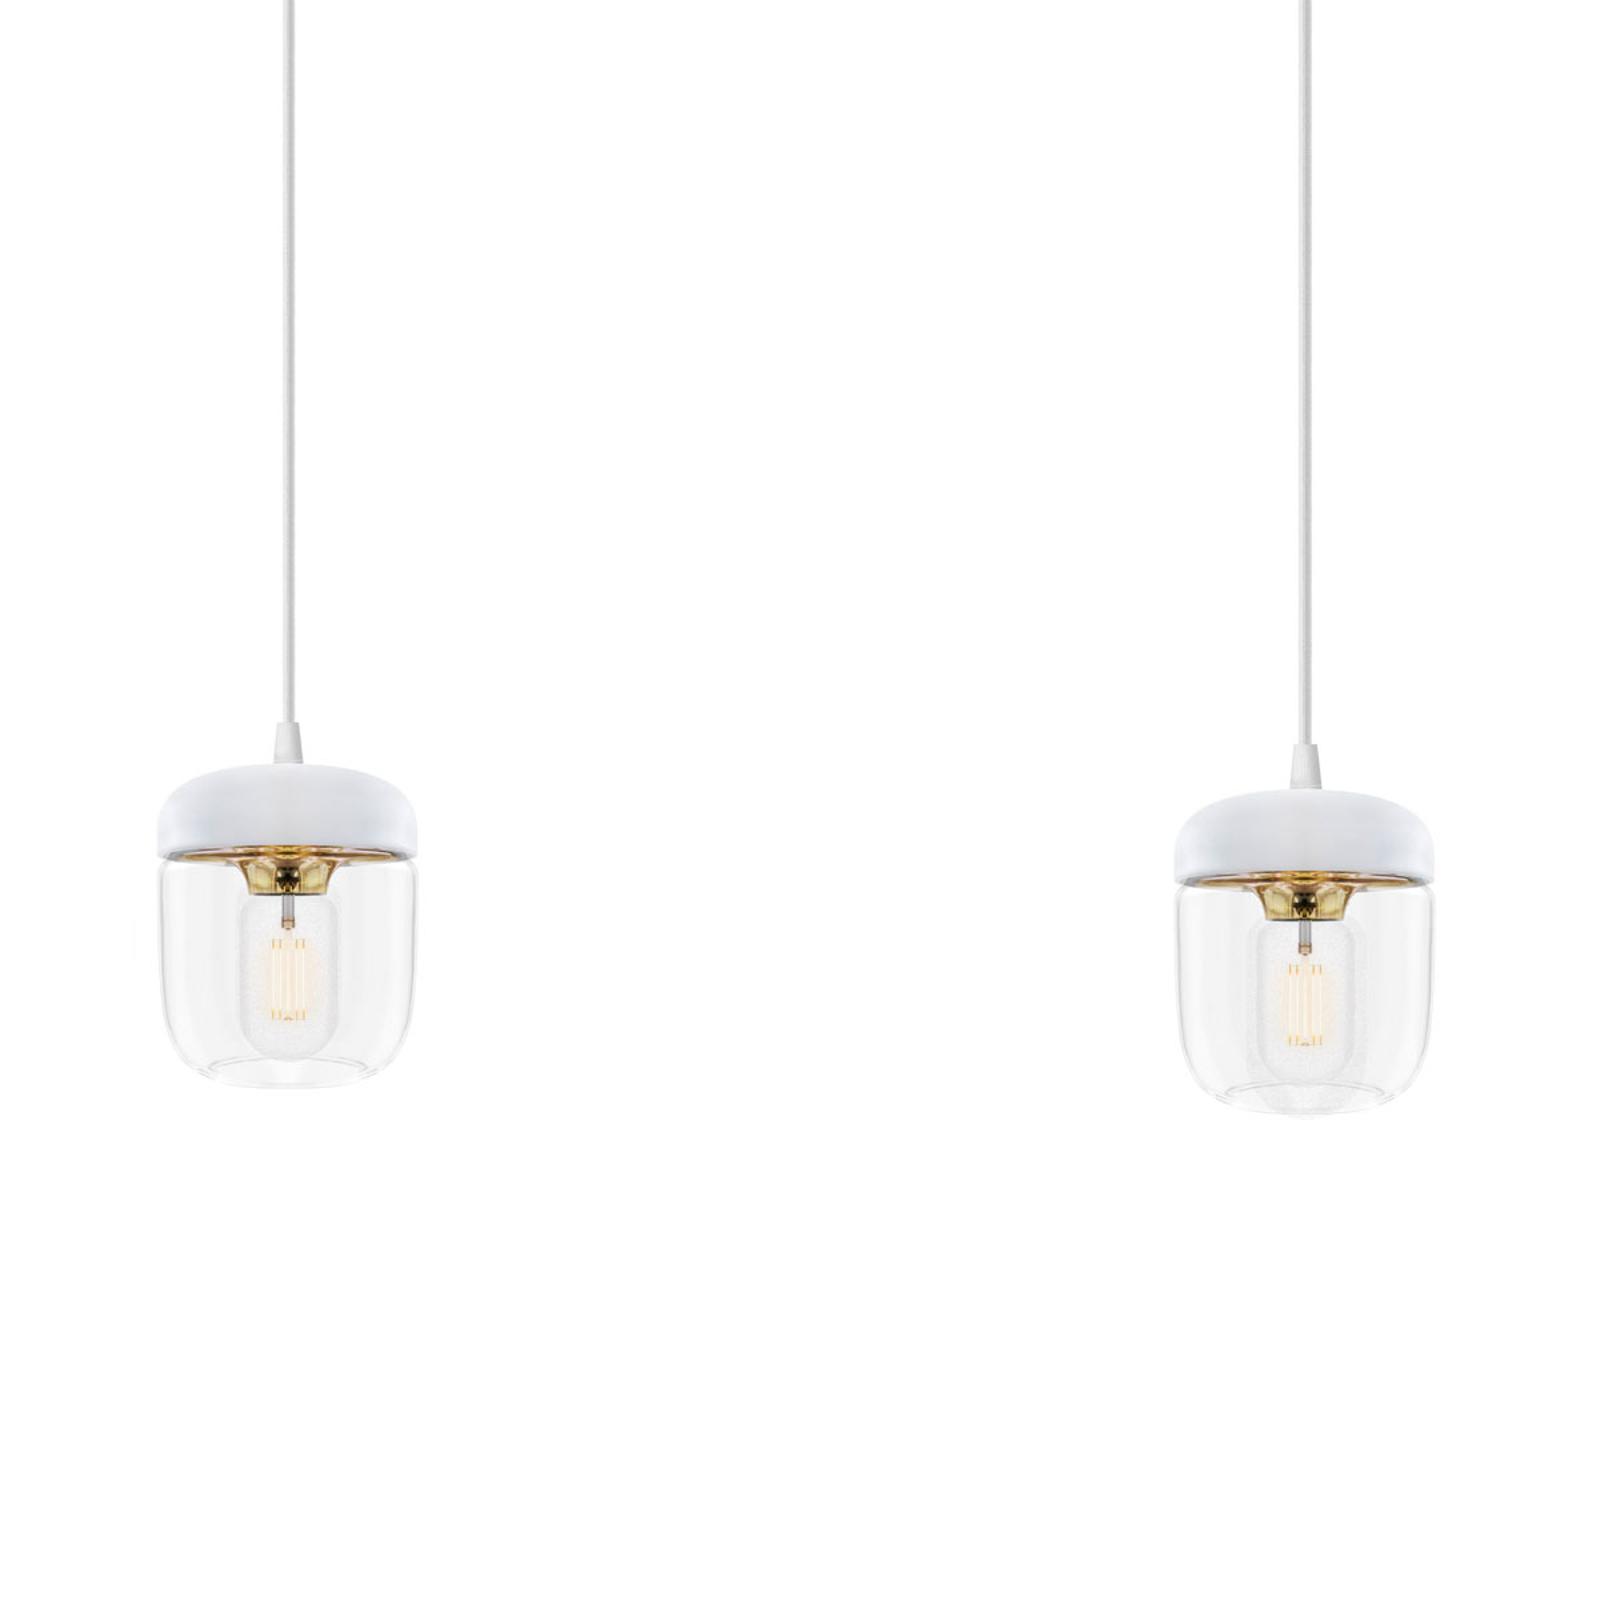 I hvid og messing - pendellampen Acorn 2 lyskilder